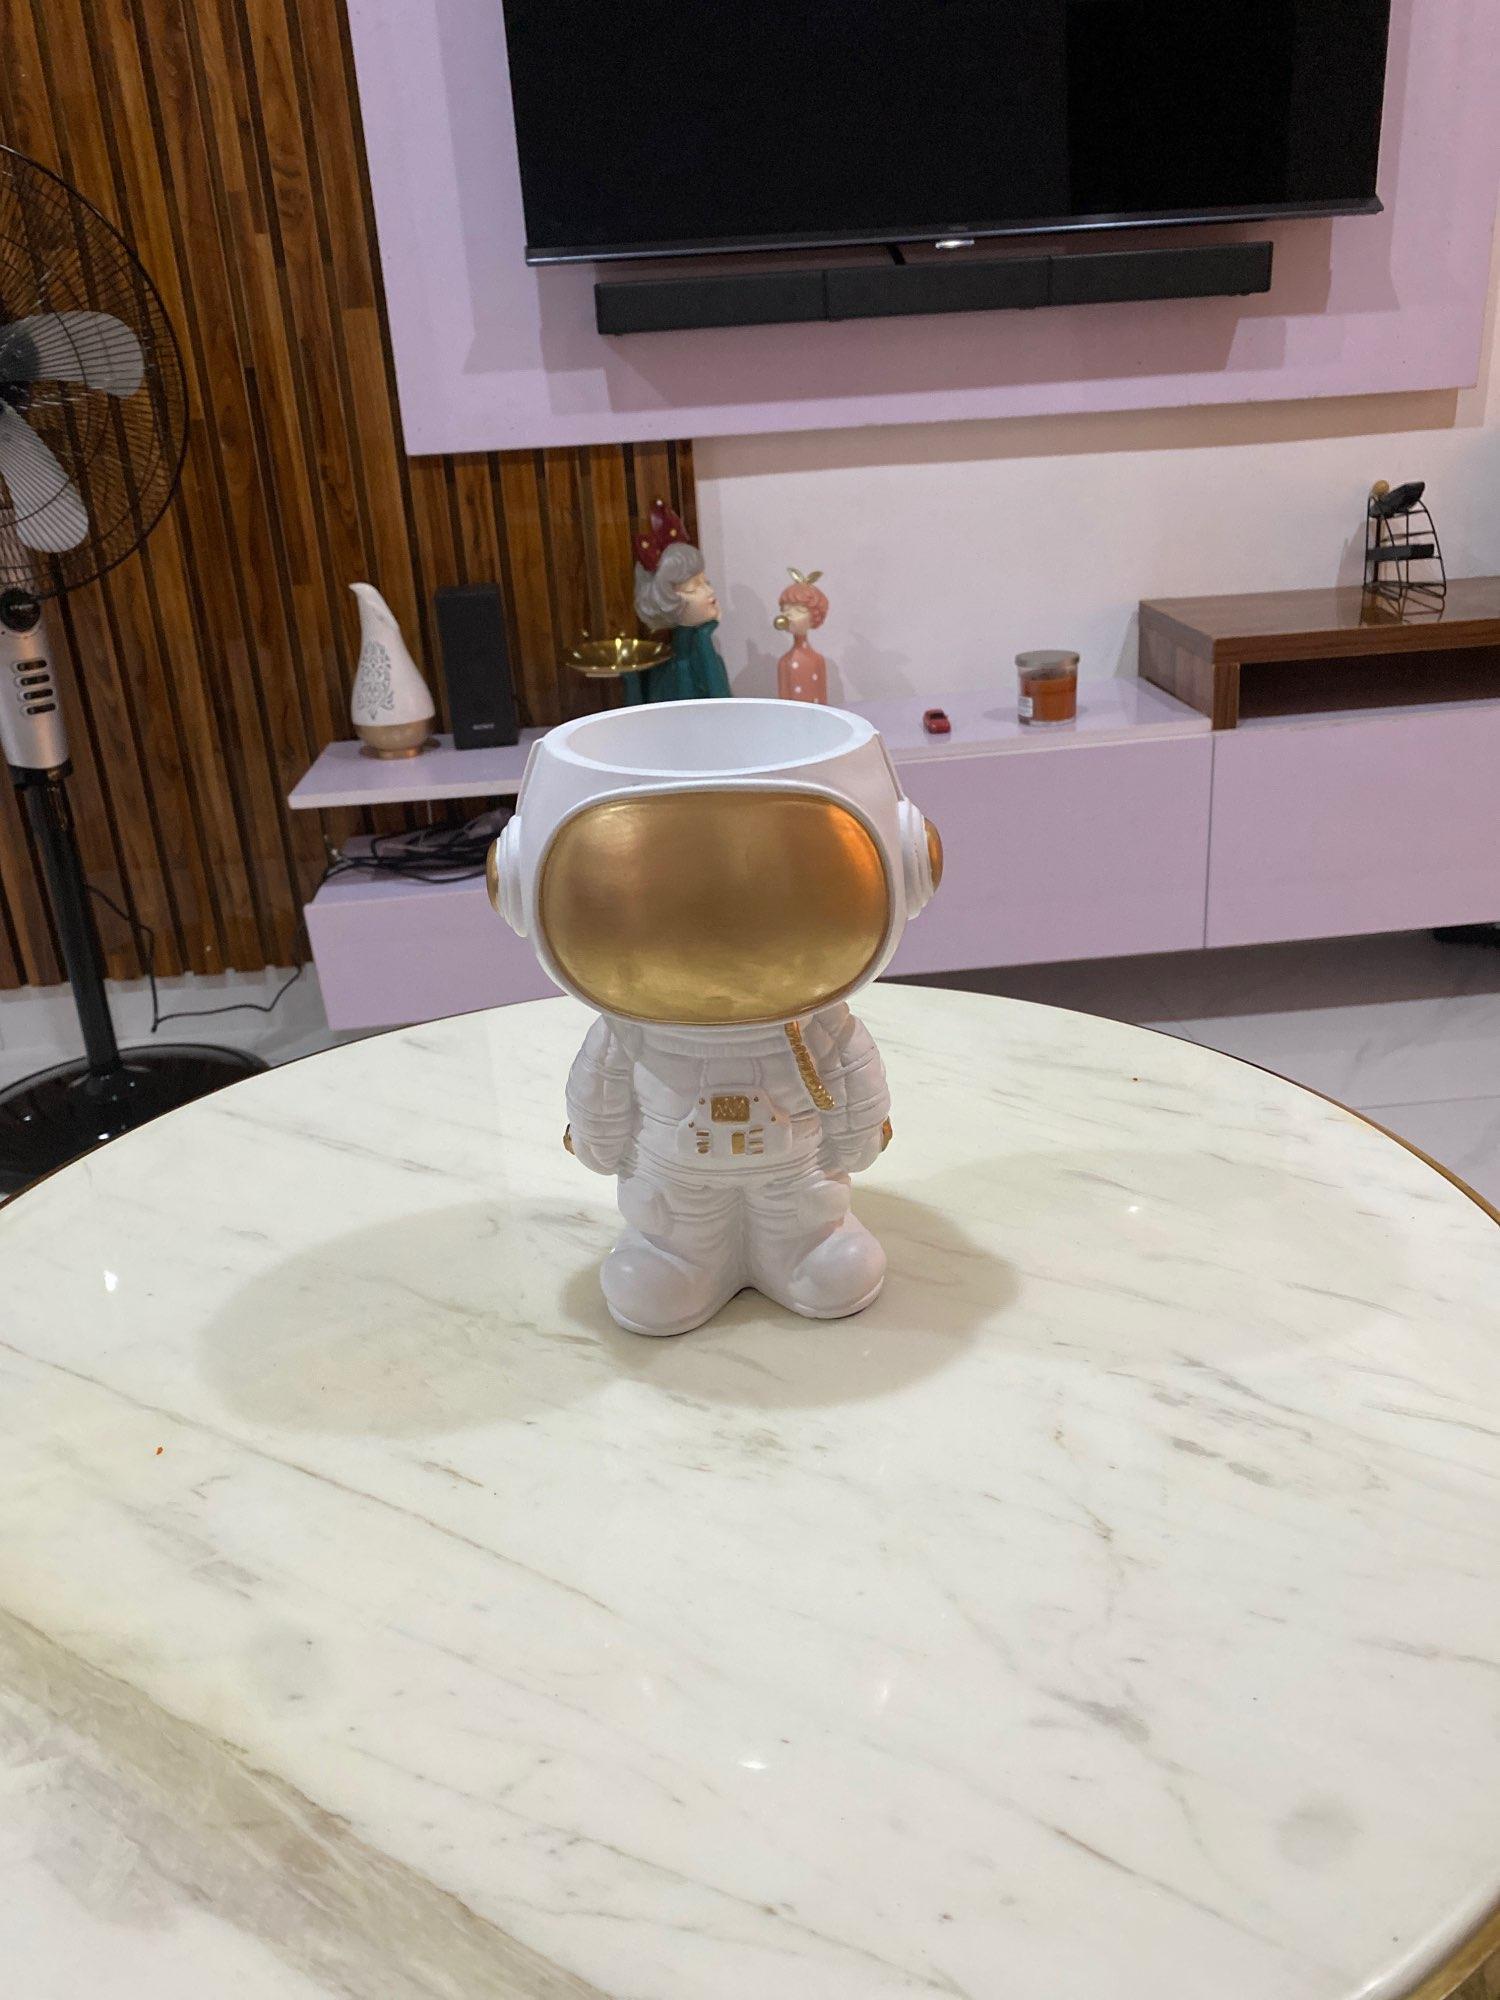 Astronaut Storage photo review